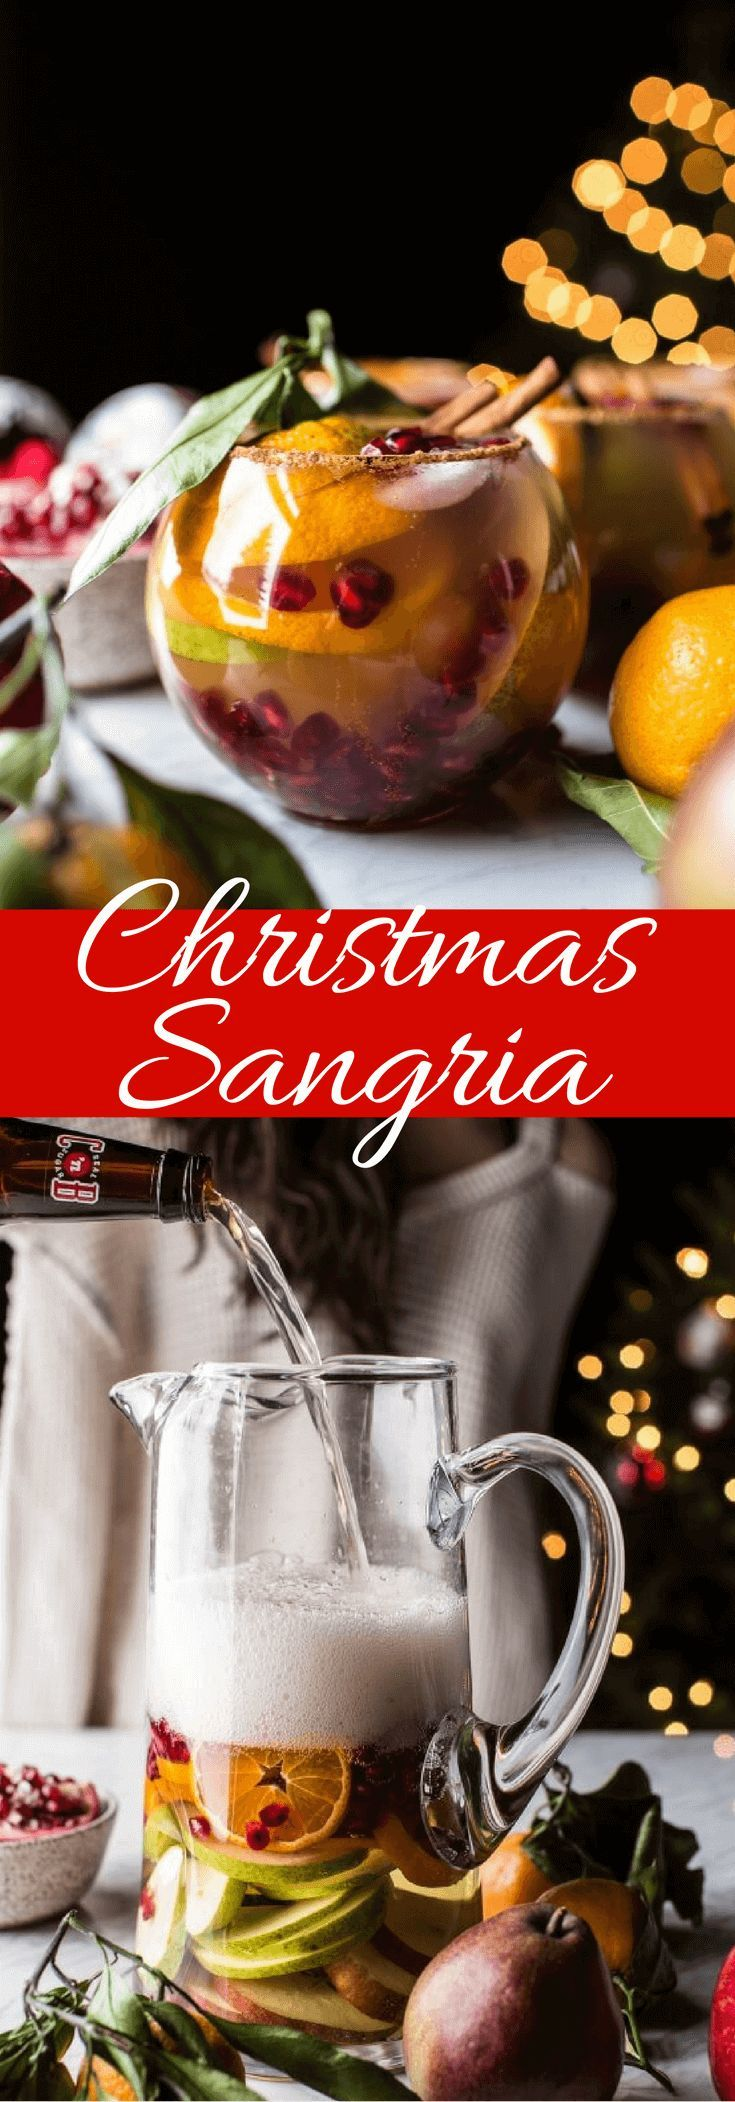 Christmas Sangria Half Baked Harvest Recipe Christmas Sangria Christmas Drinks Christmas Cooking